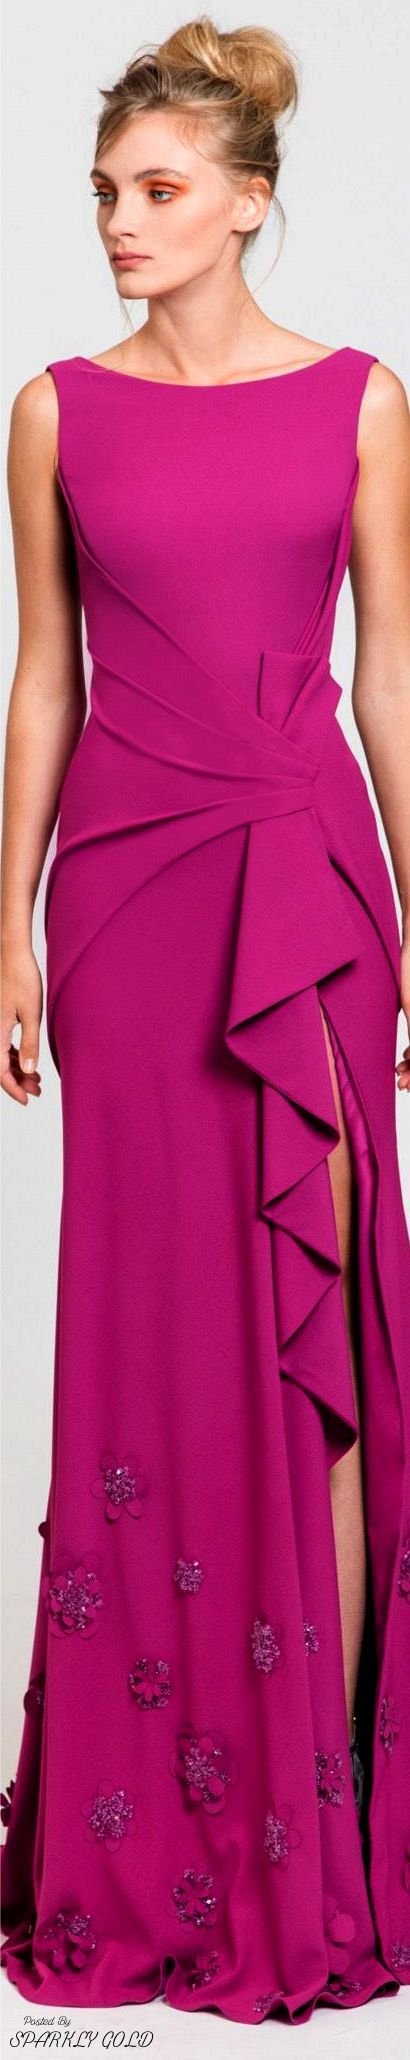 Tony ward spring rtw bodas pinterest spring maxi dresses